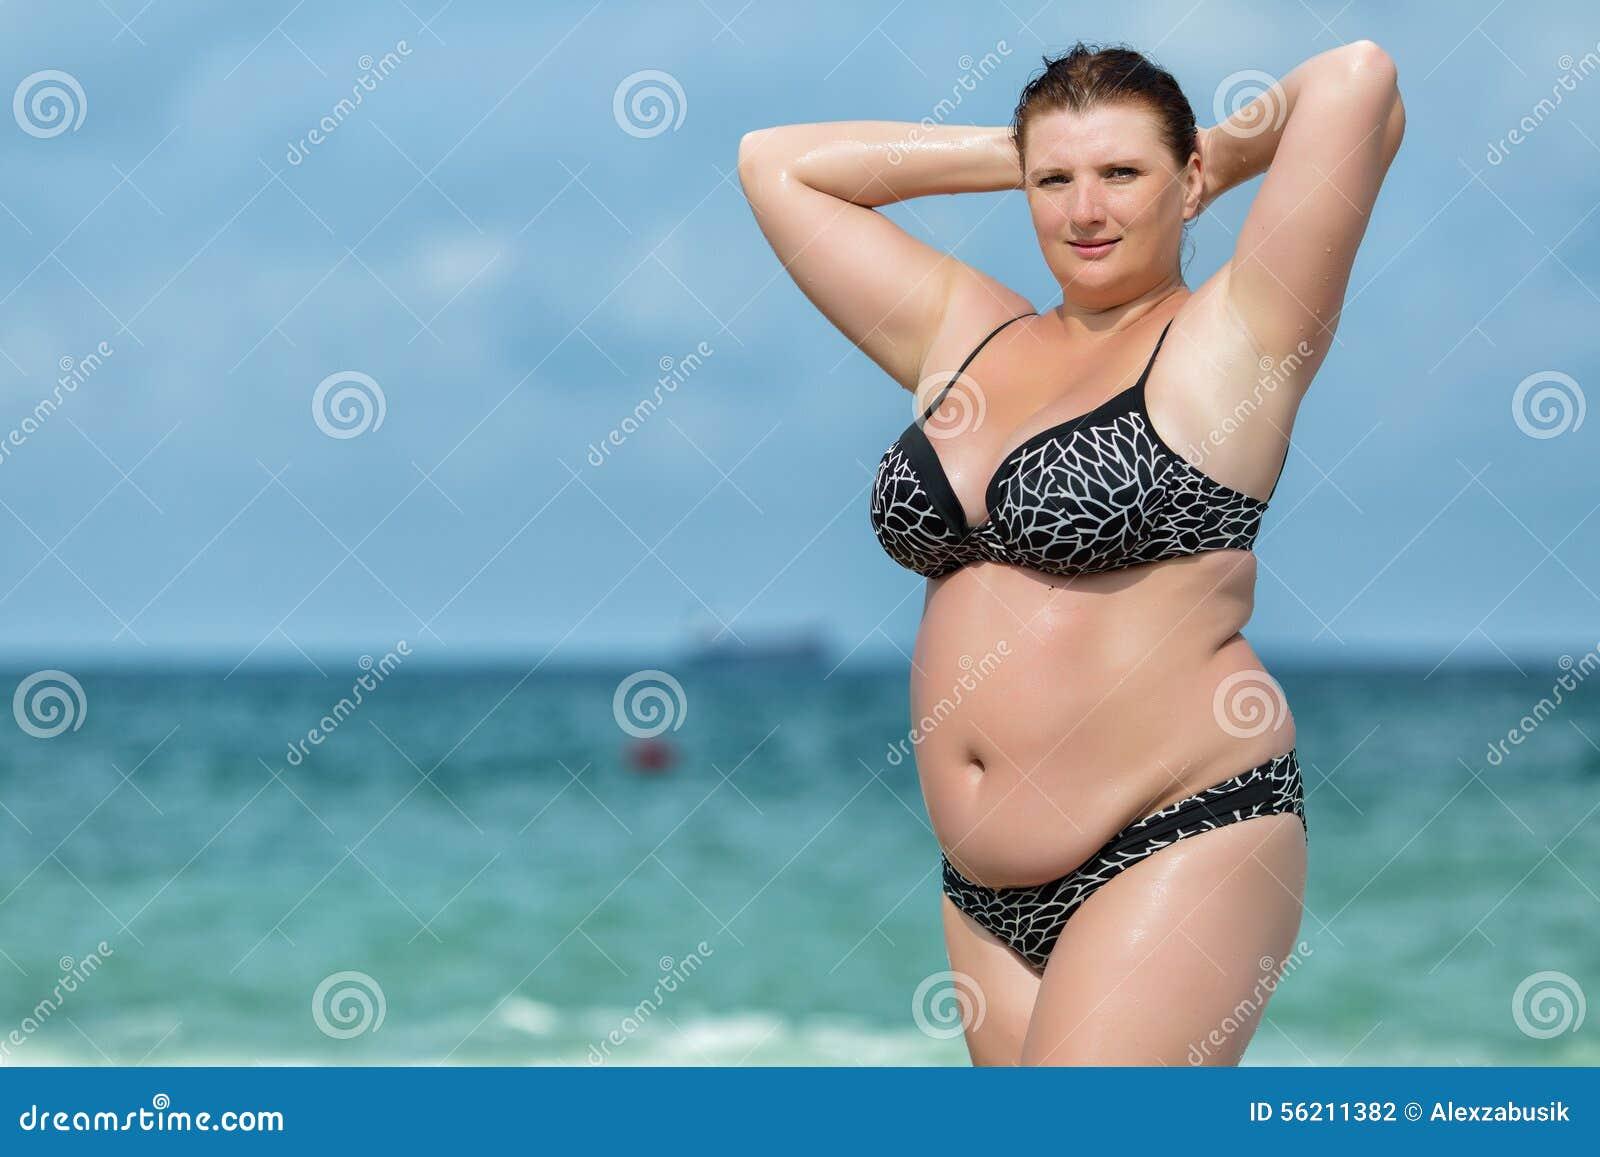 Theme Bajar bikini chicos de en para programas